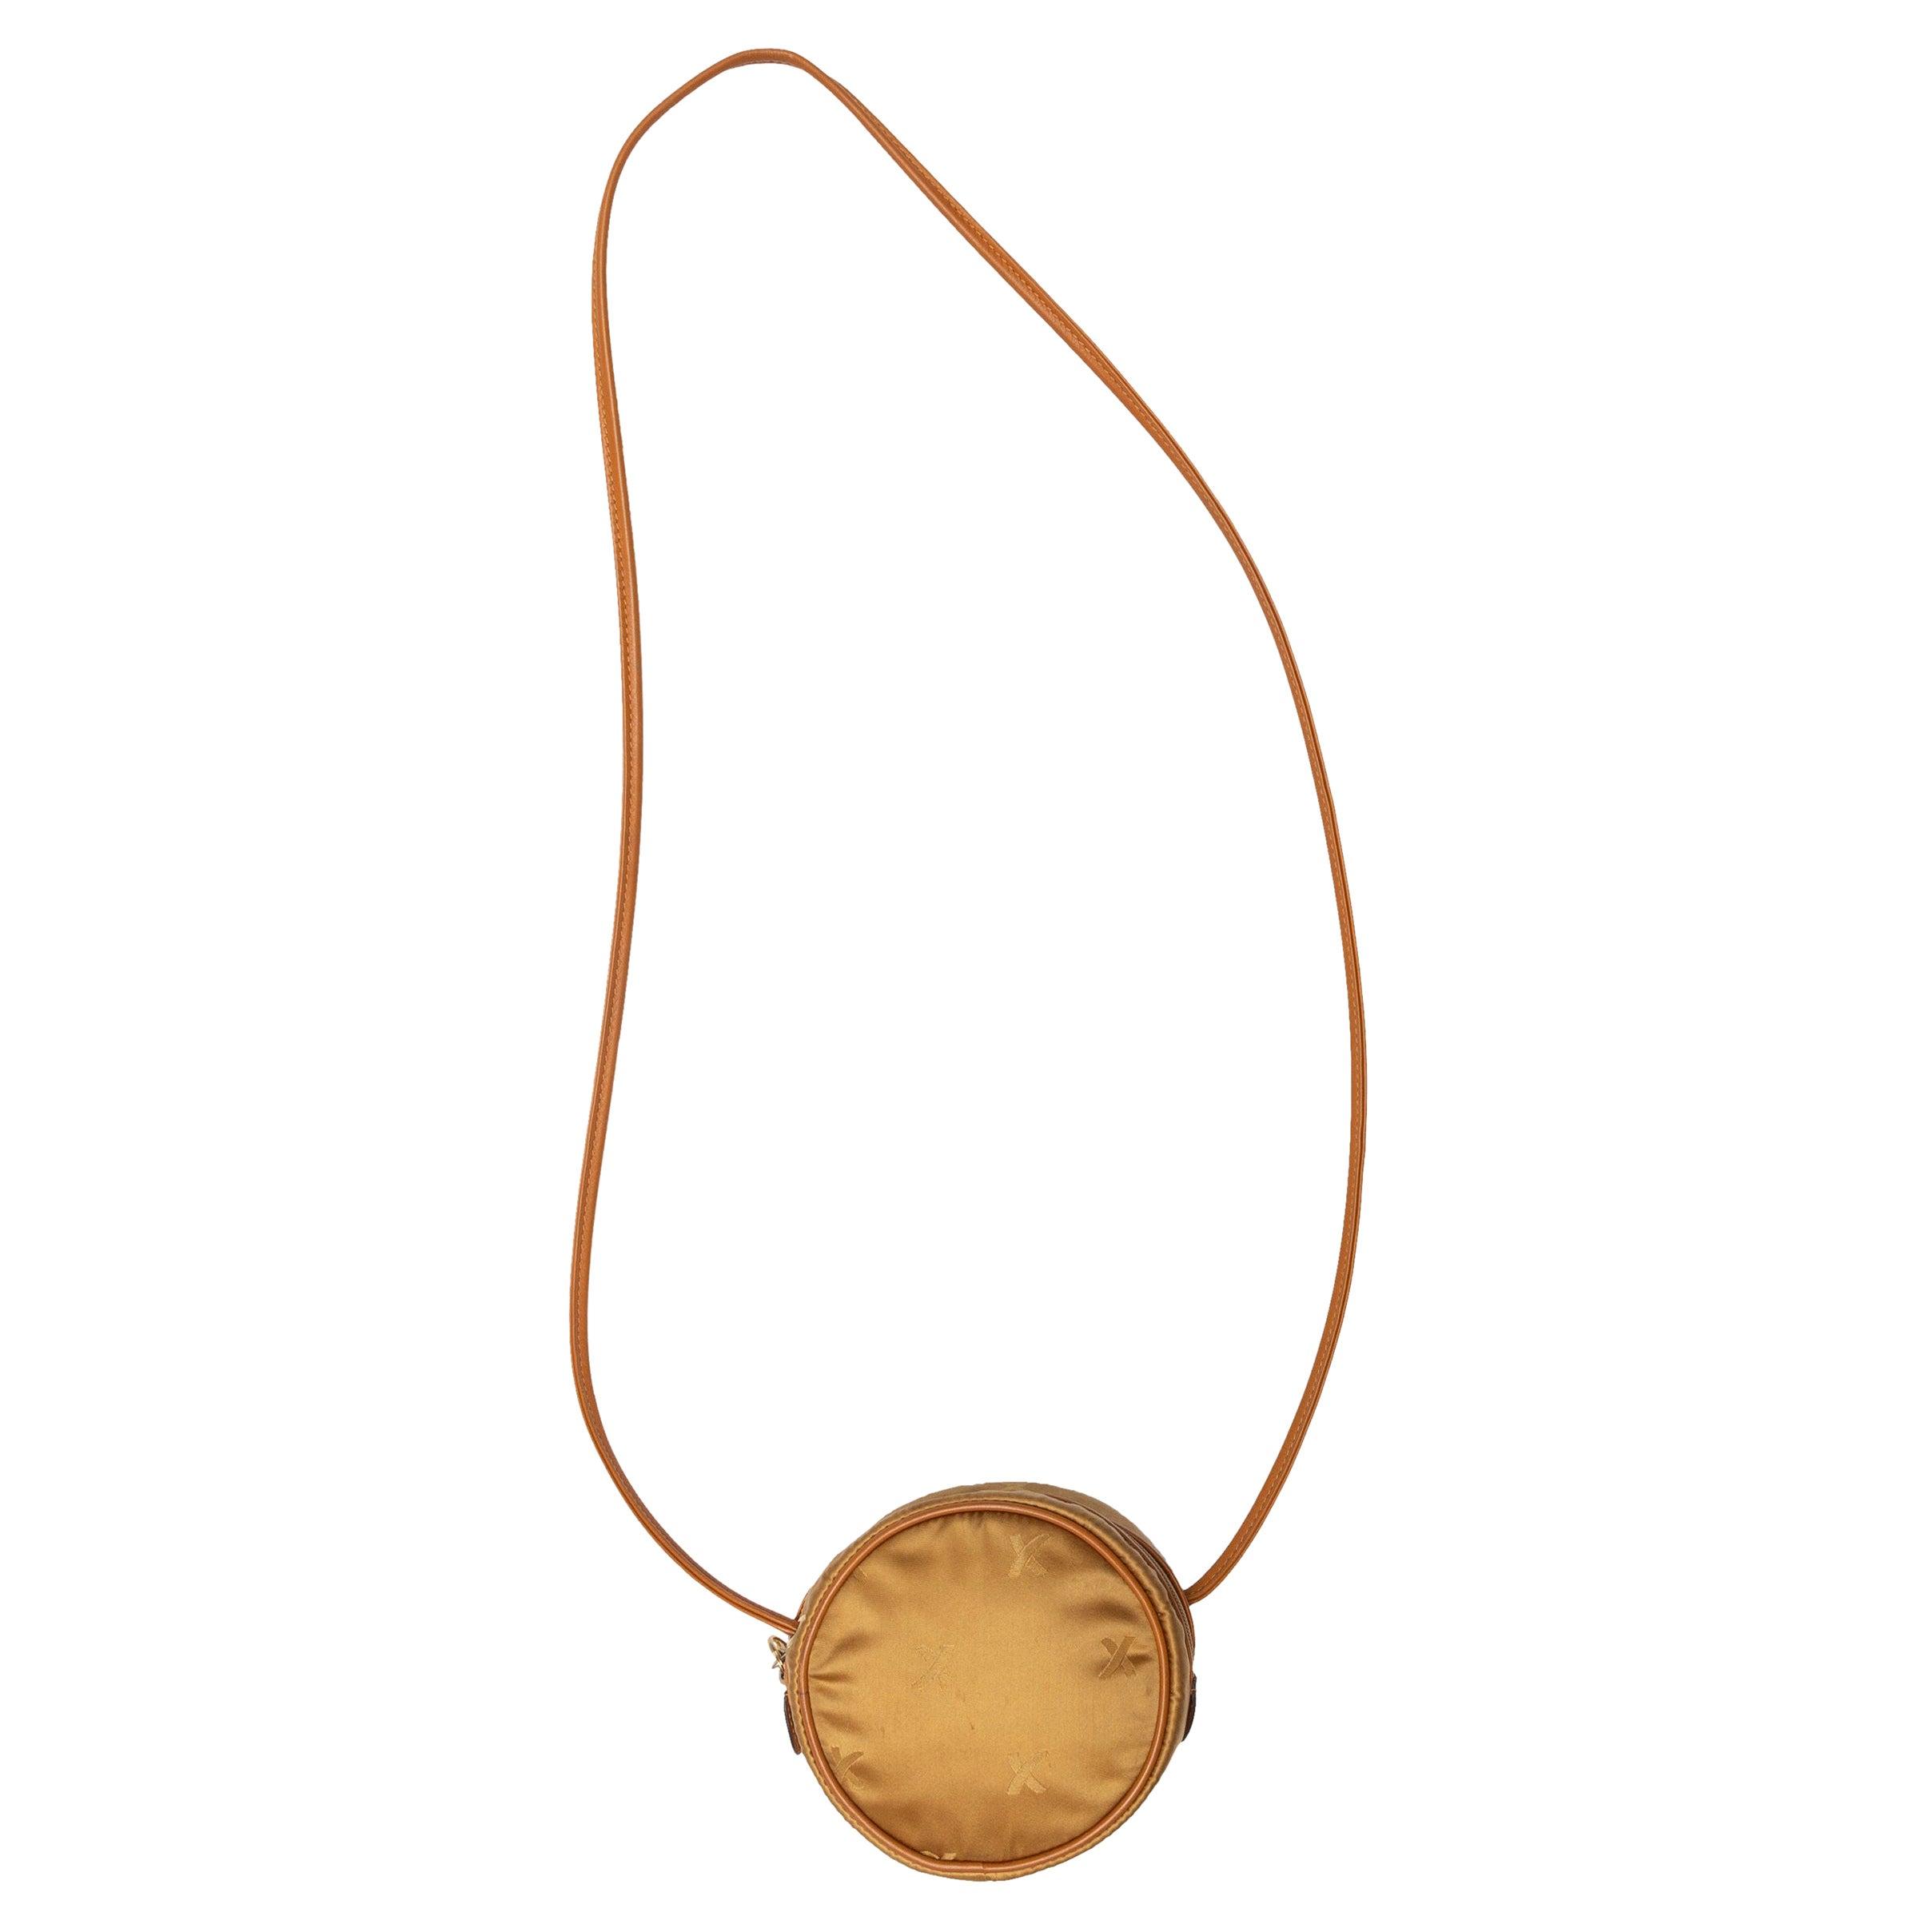 Paloma Picasso Gold Circular Crossbody Bag